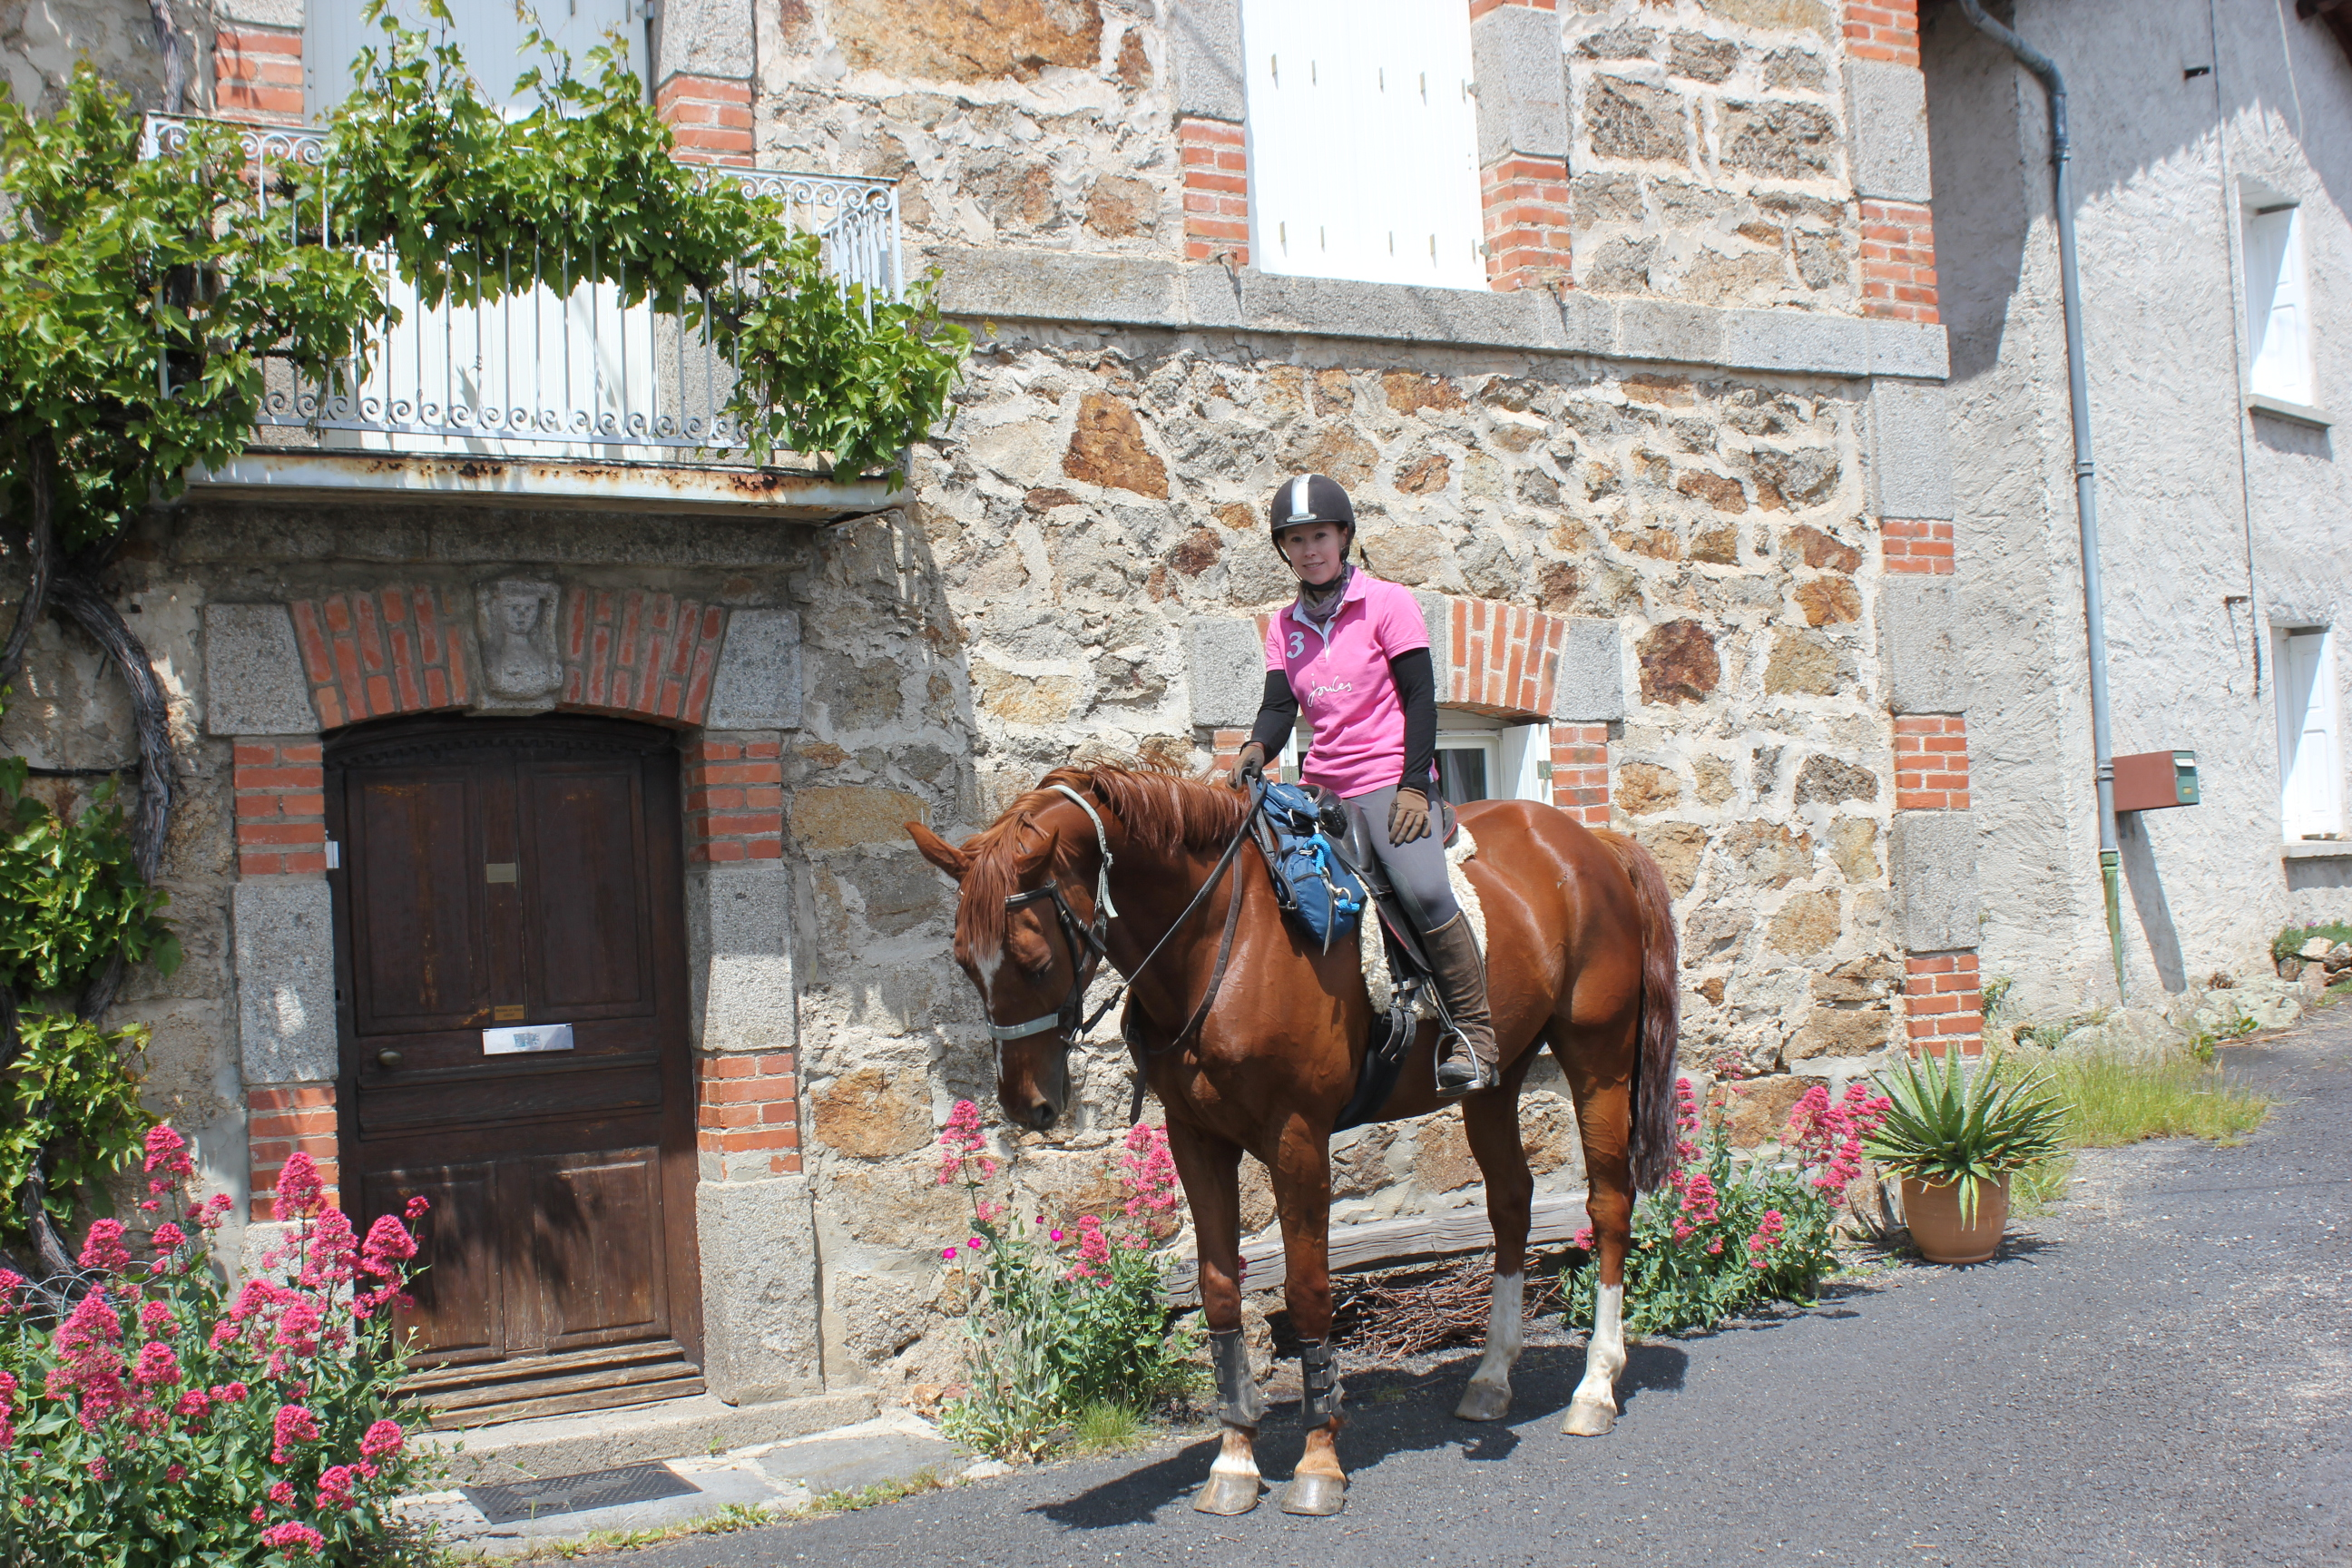 Abbie exploring little villages on horseback